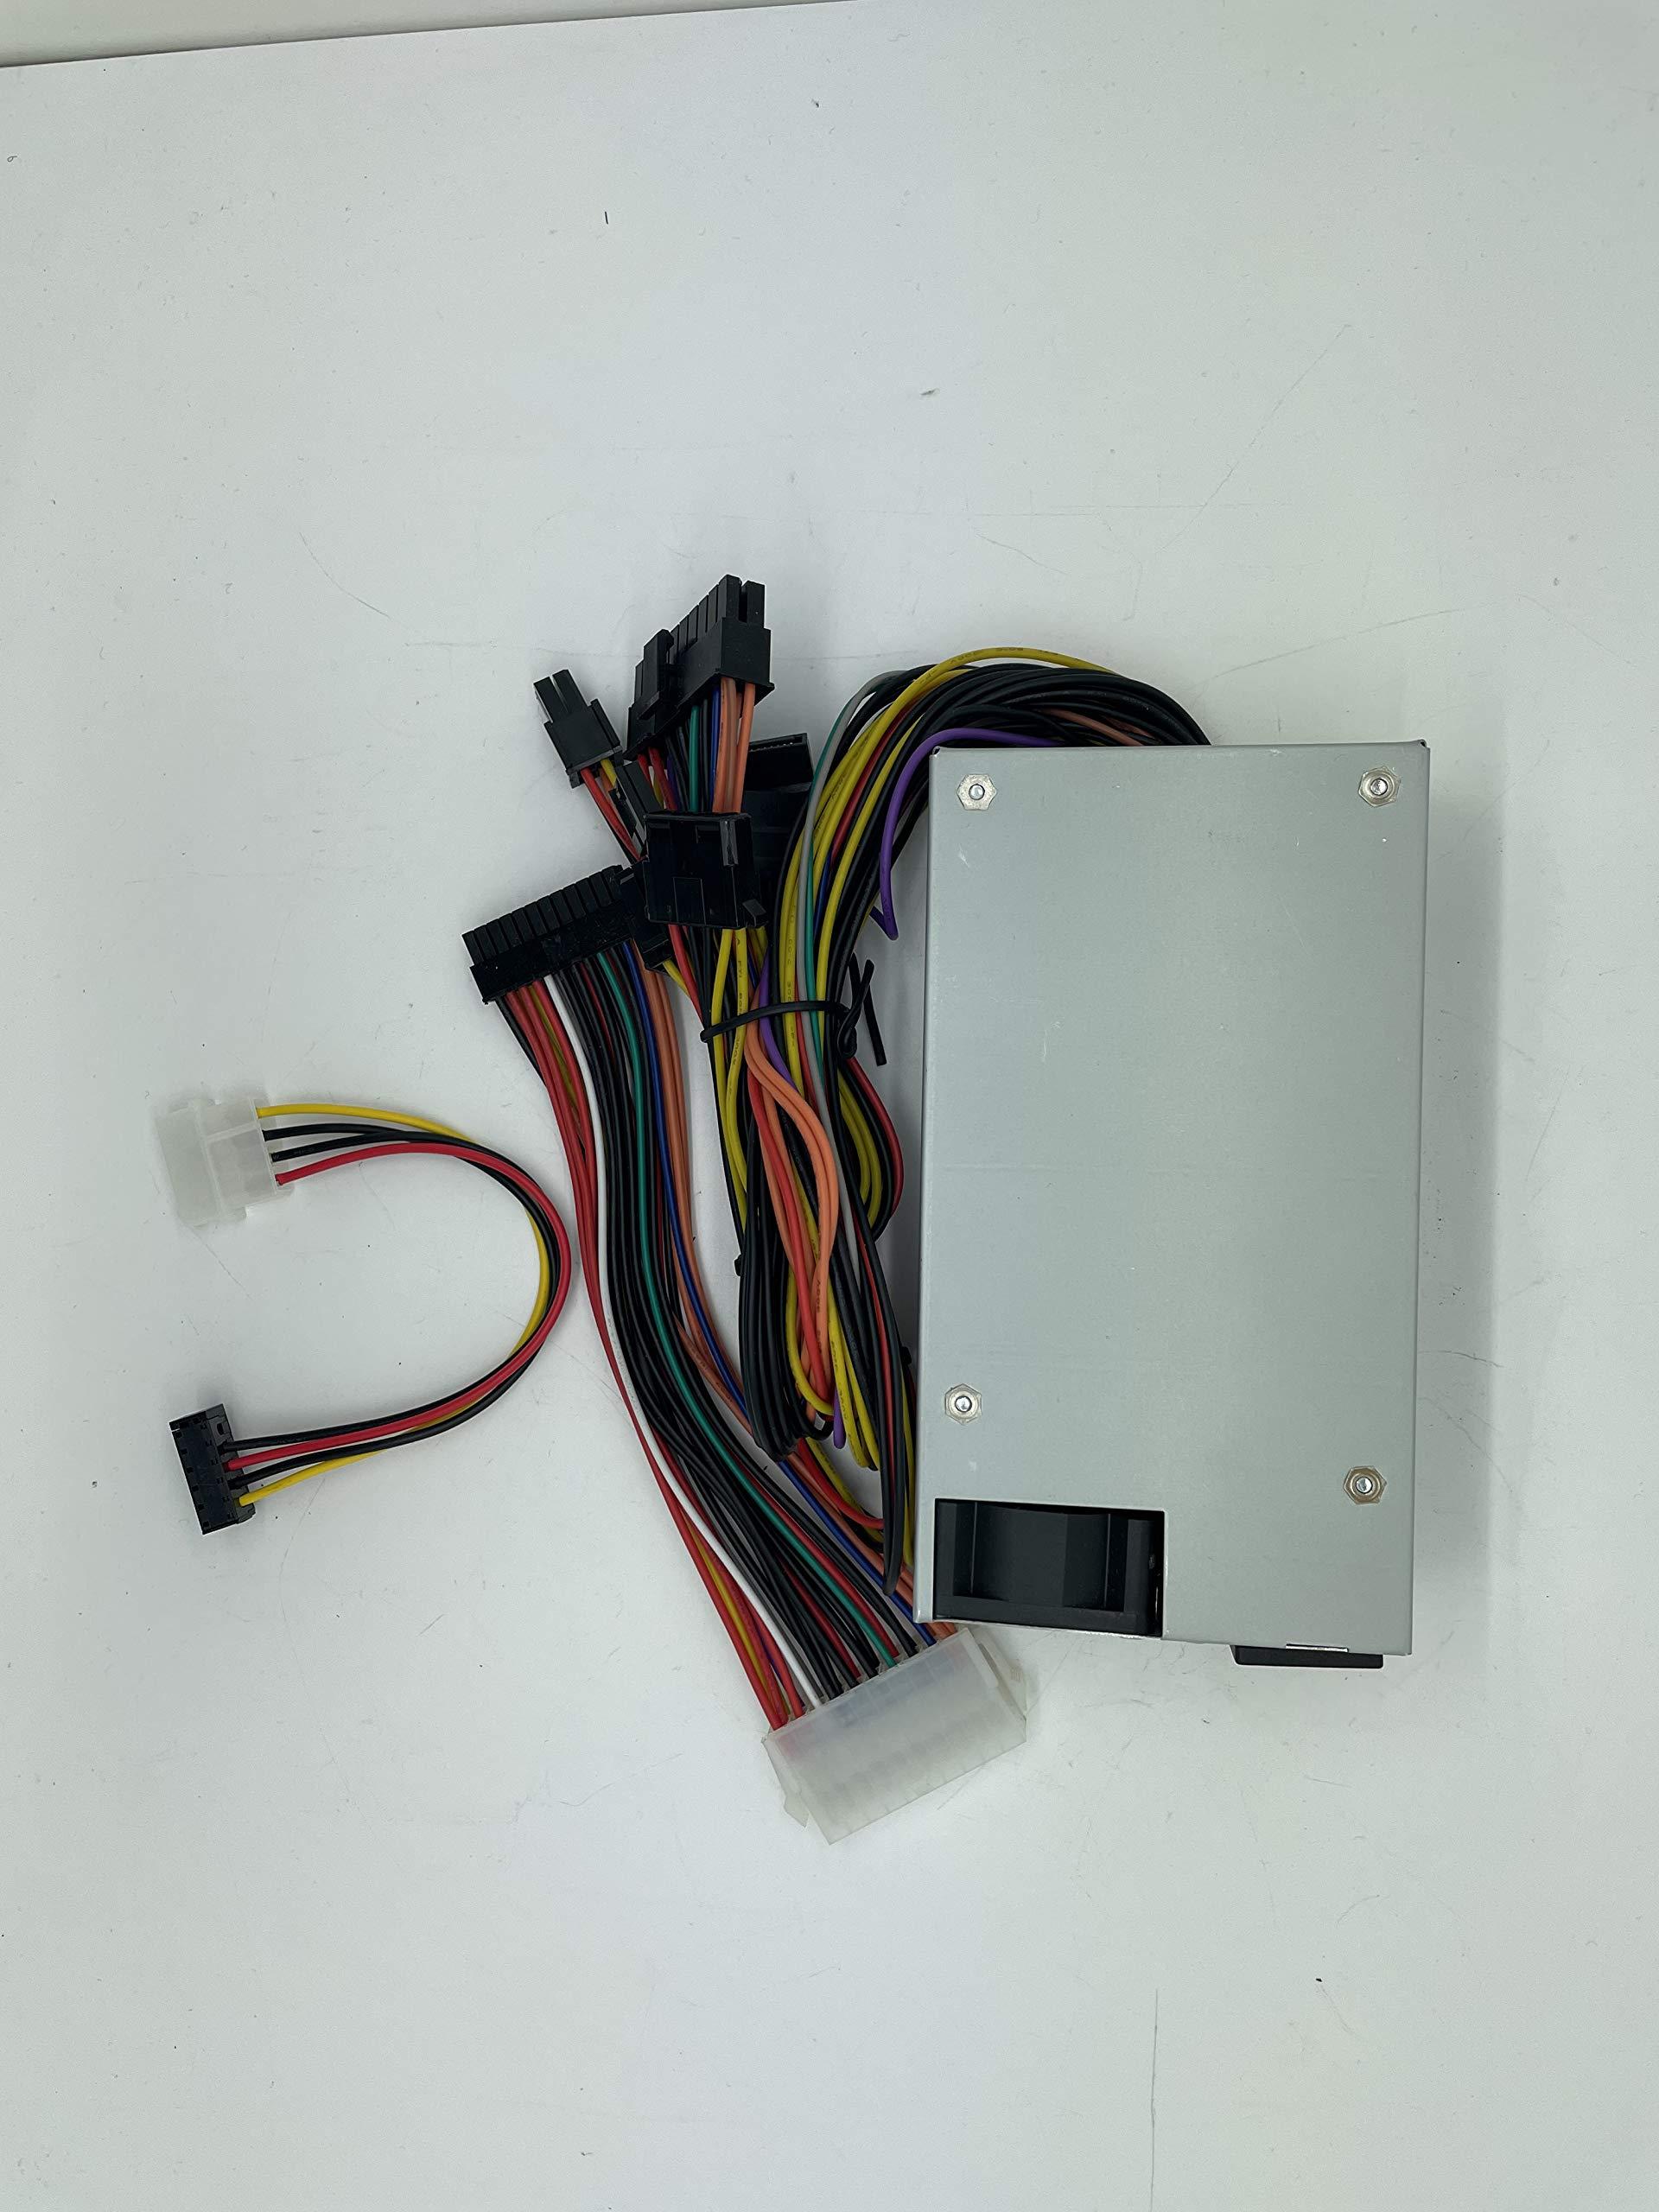 Replace Power 350 Watt 350W Flex ATX Power Supply Replacement for HP Pavilion Slimline 5188-7520, 5188-7521, 5188-2755,